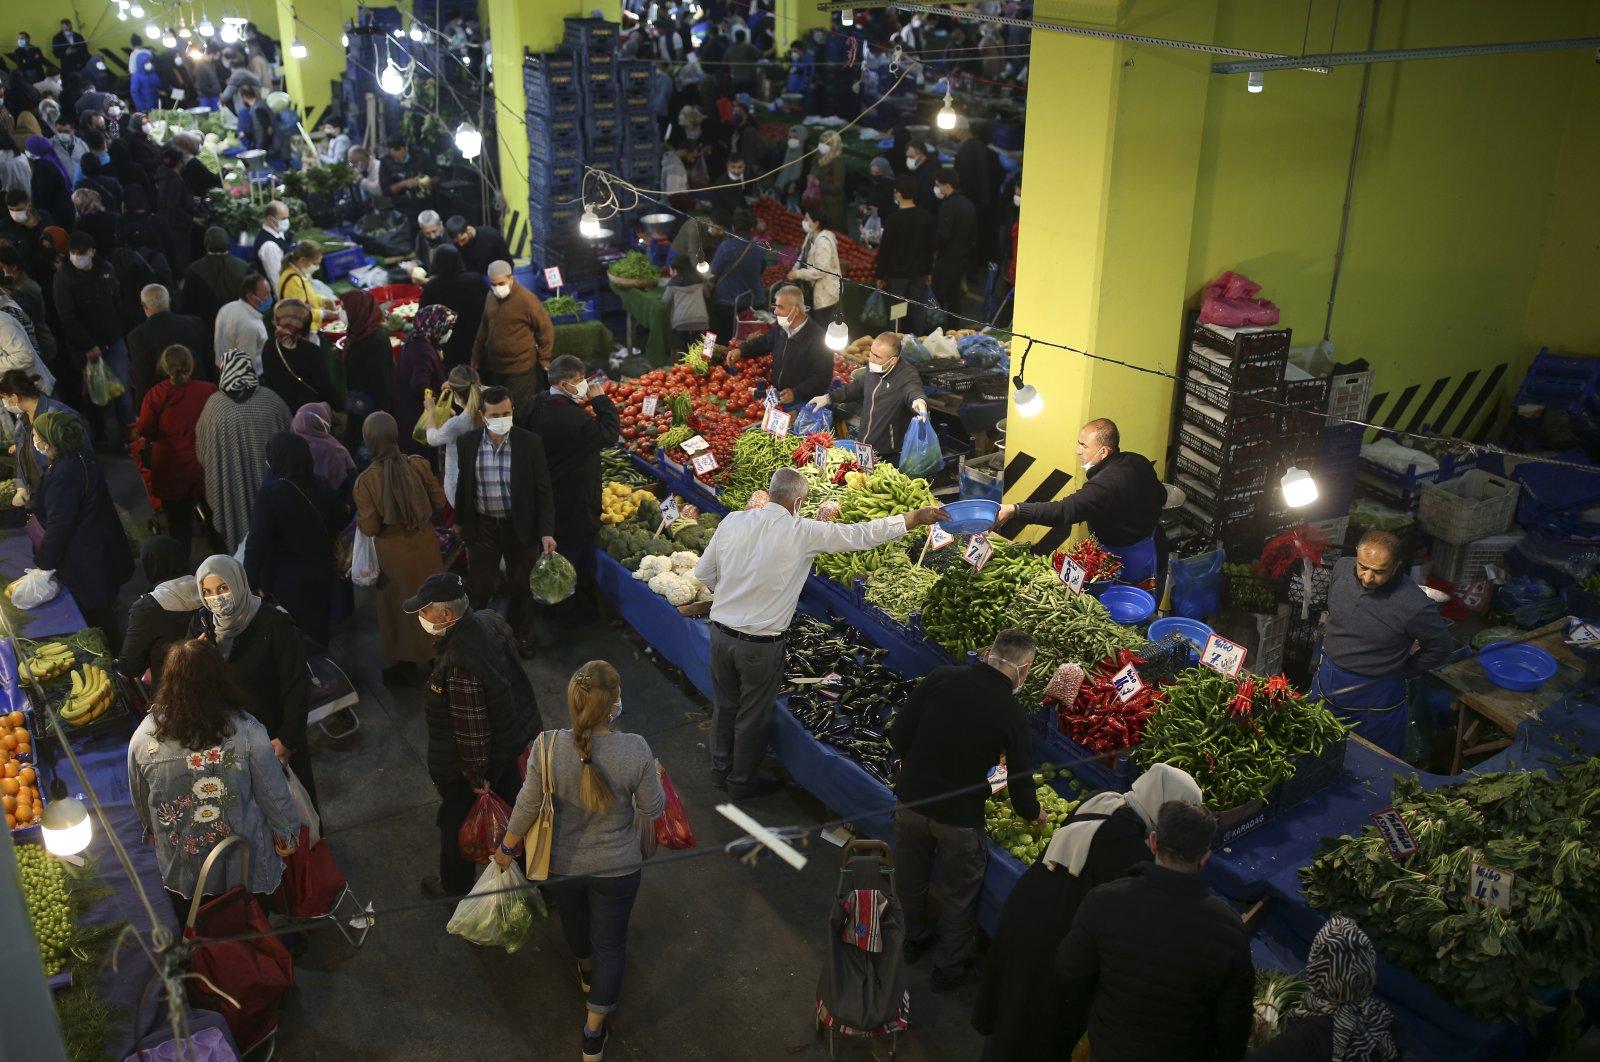 People shop in a street market in Istanbul, Turkey, April 29, 2021. (AP Photo)